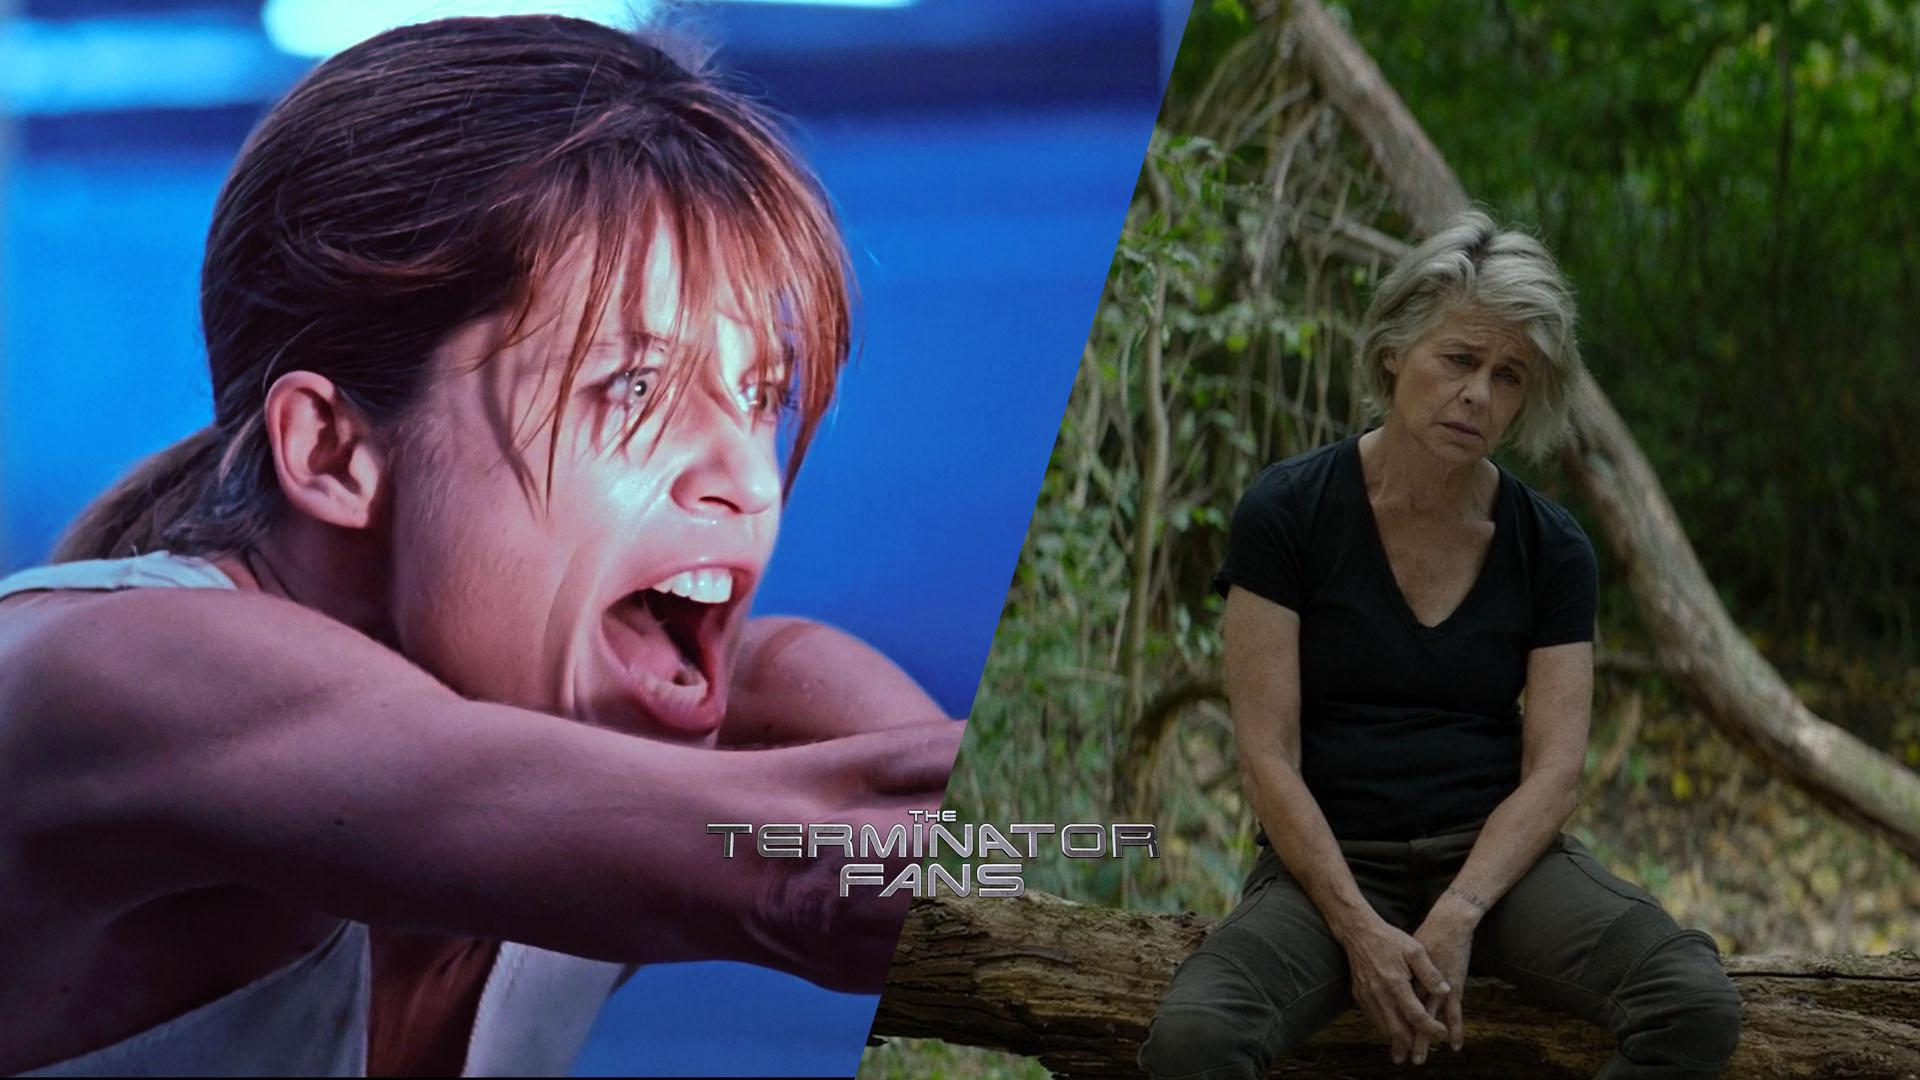 David S. Goyer Talks Terminator: Dark Fate Script and Bringing Back Sarah Connor